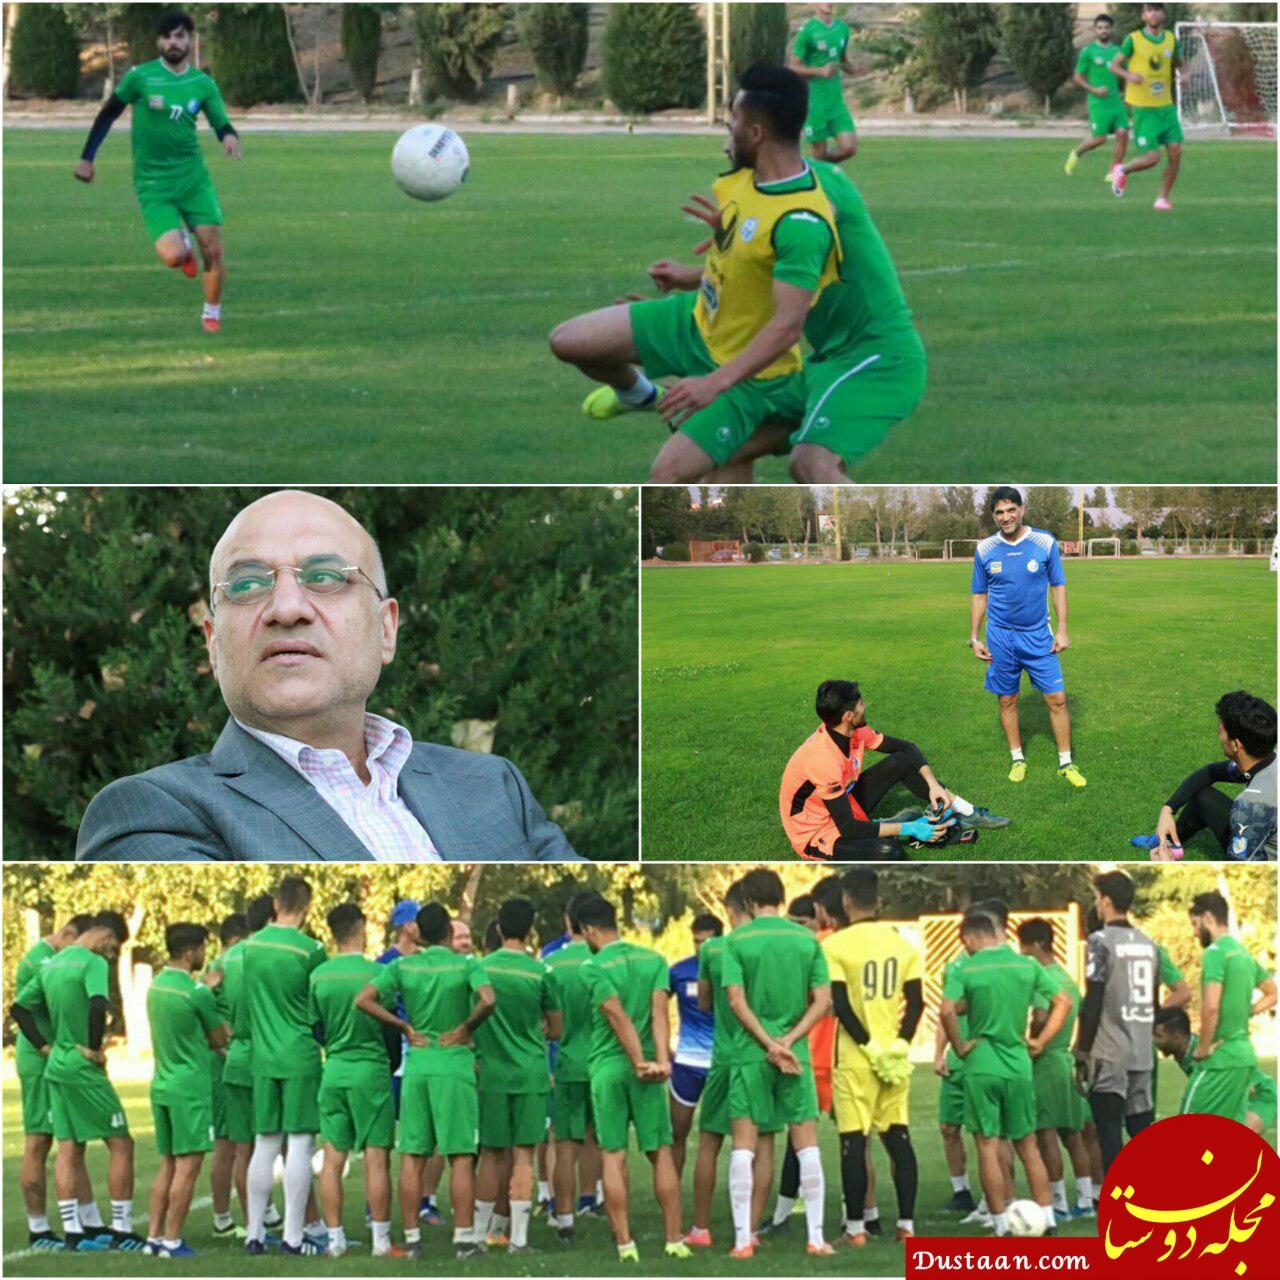 www.dustaan.com گزارشی کوتاه از تمرین امروز استقلال / 11 مهر